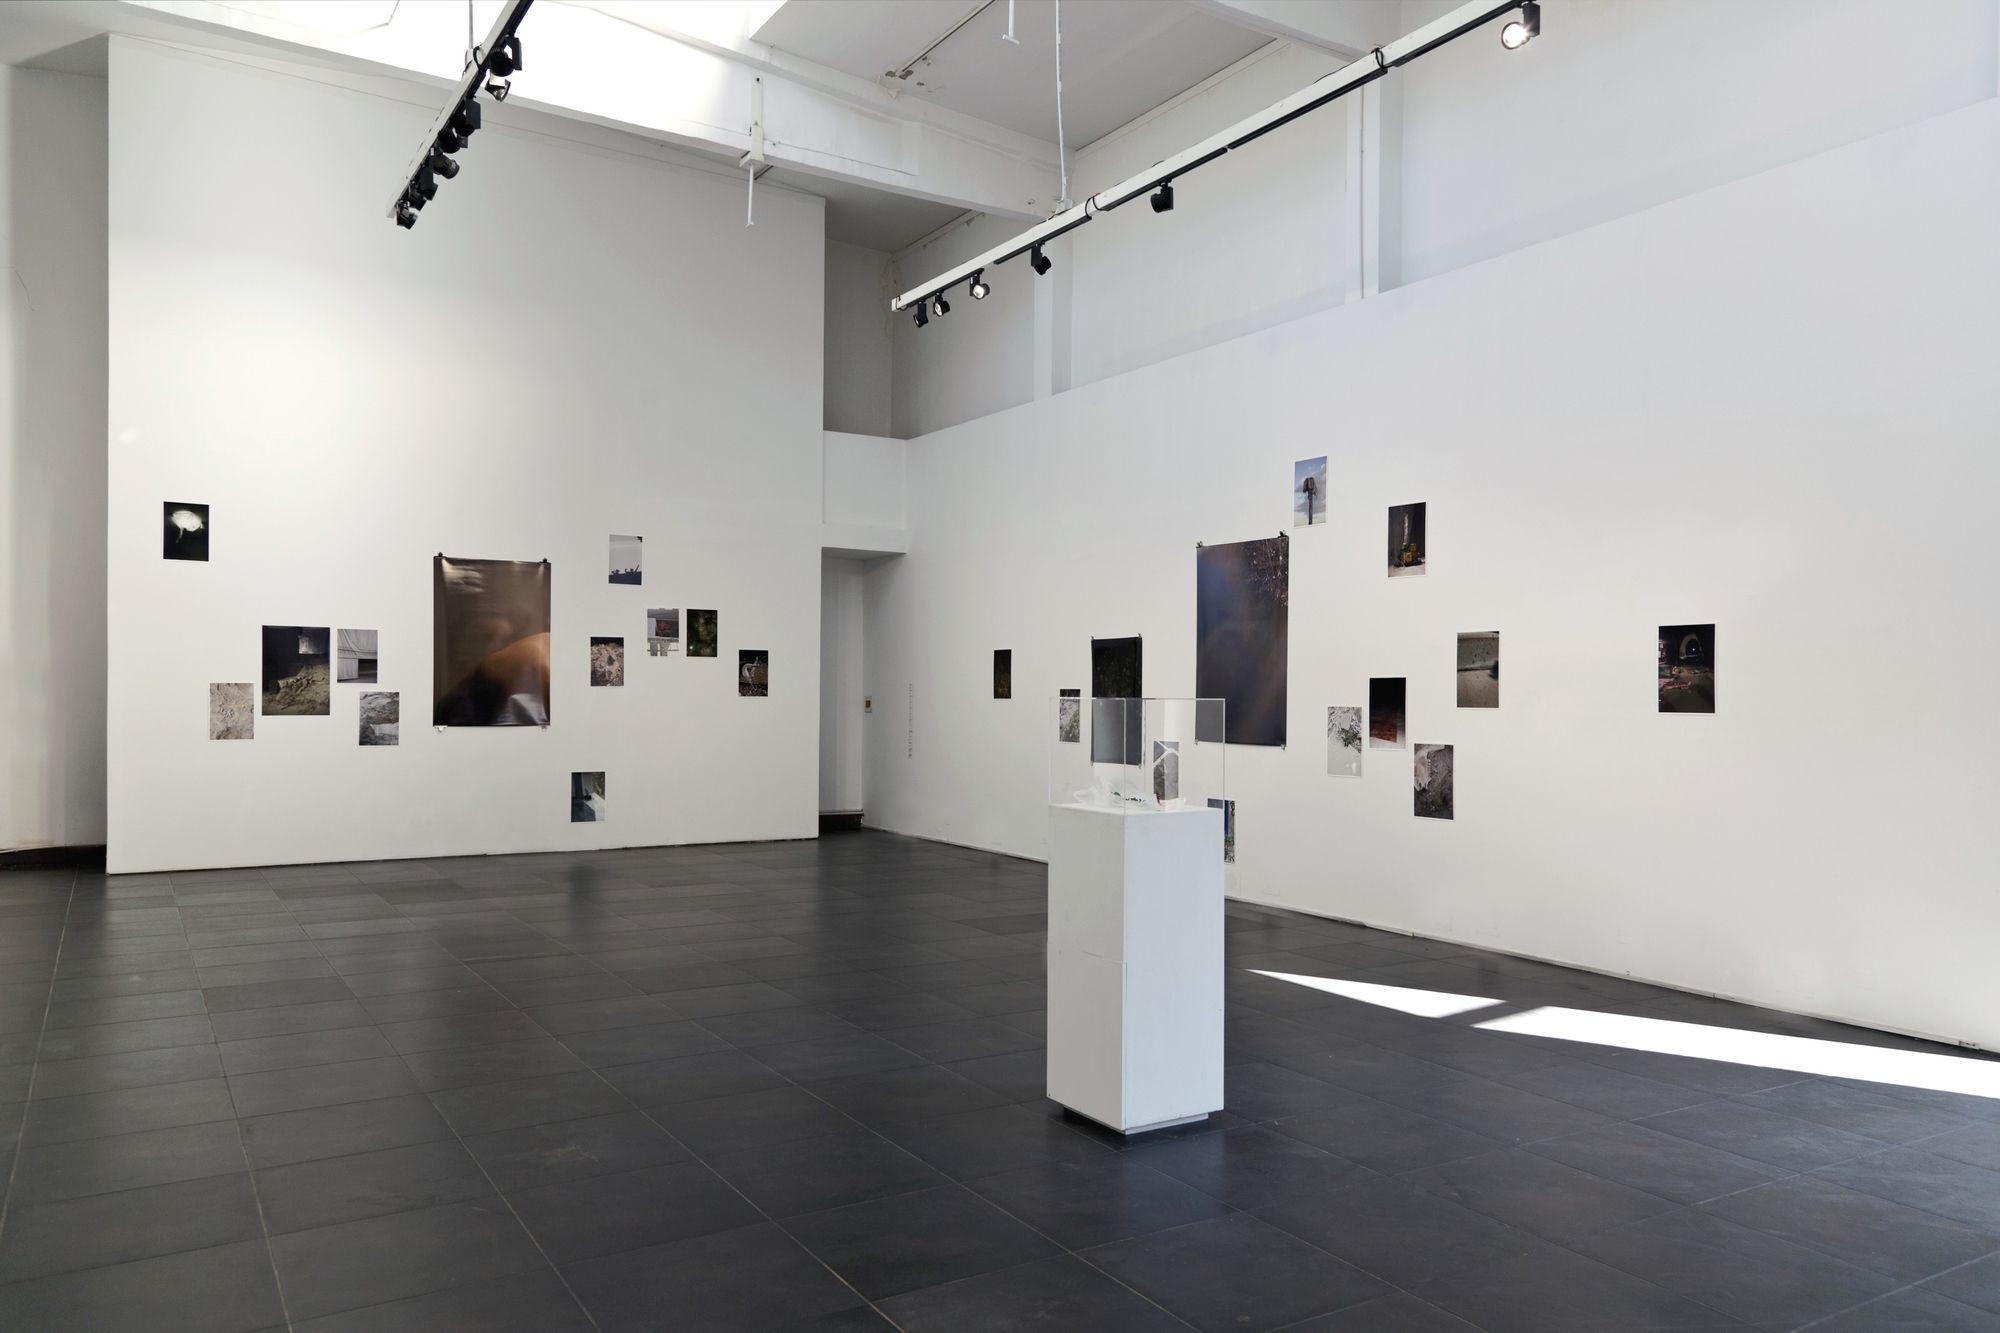 Silja Yvette 'SEASON OF ADMIN' - installation view